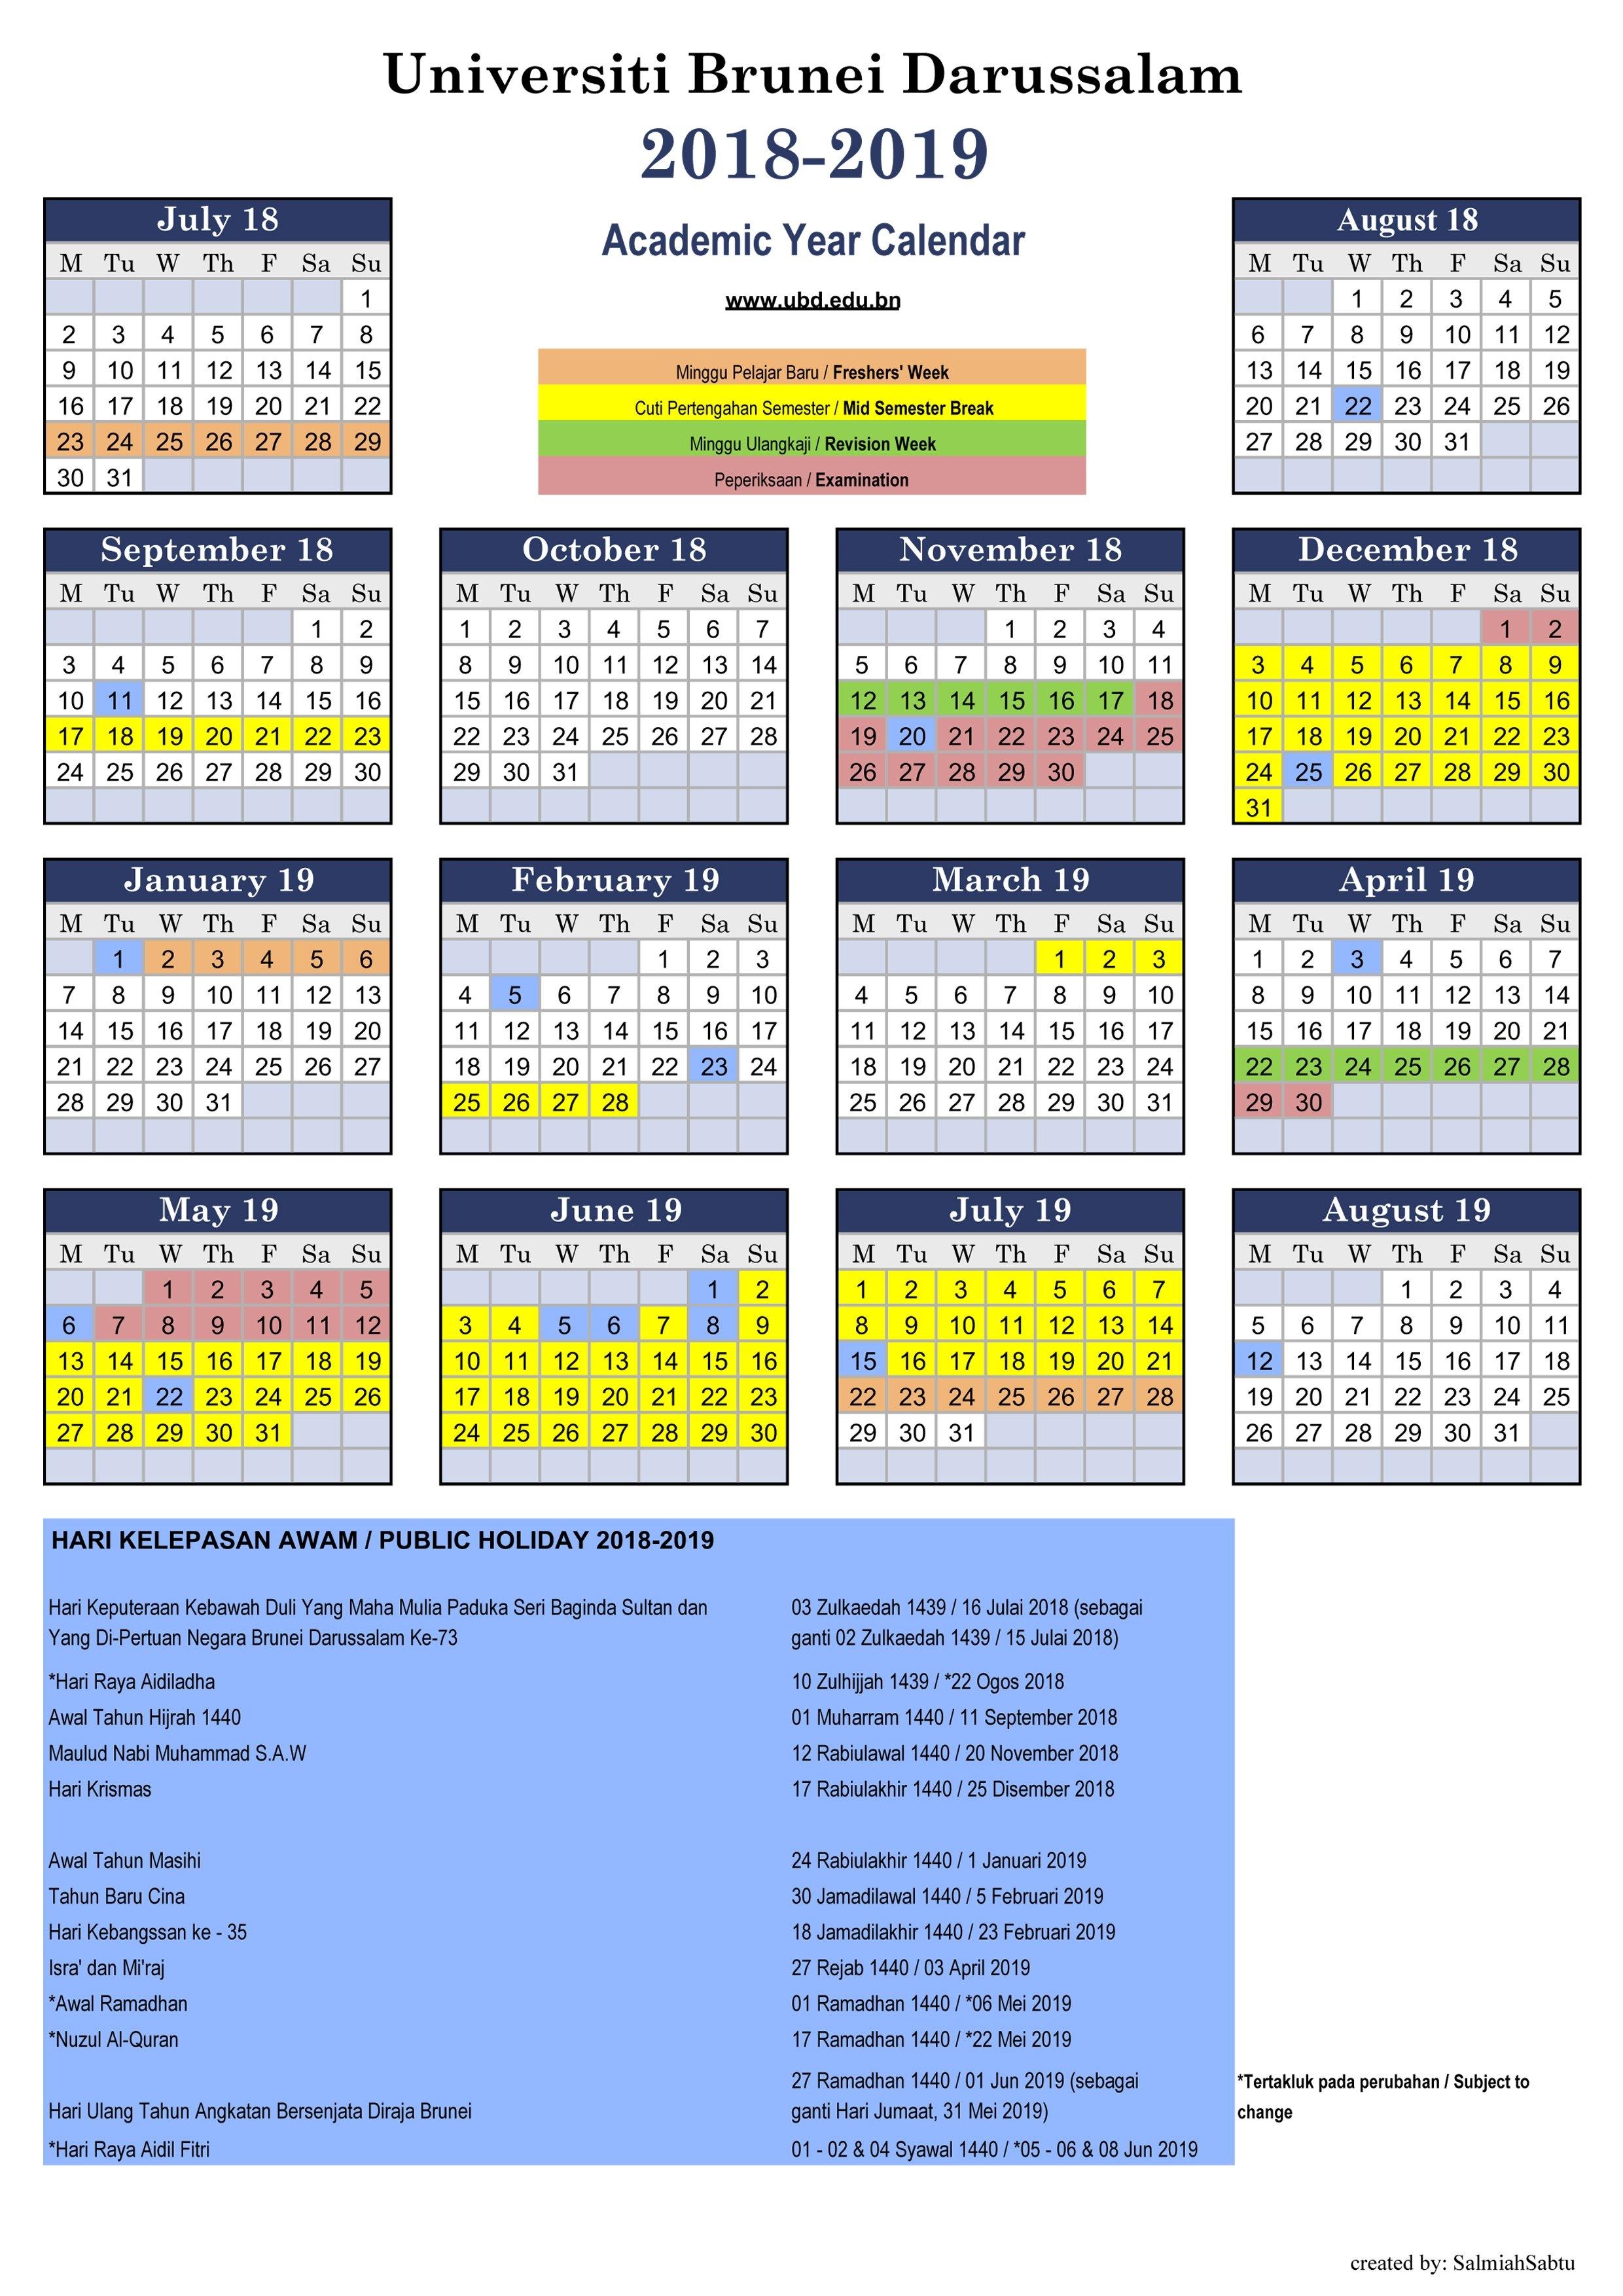 Universiti Brunei Darussalam Calendar 2019 Bulan 3